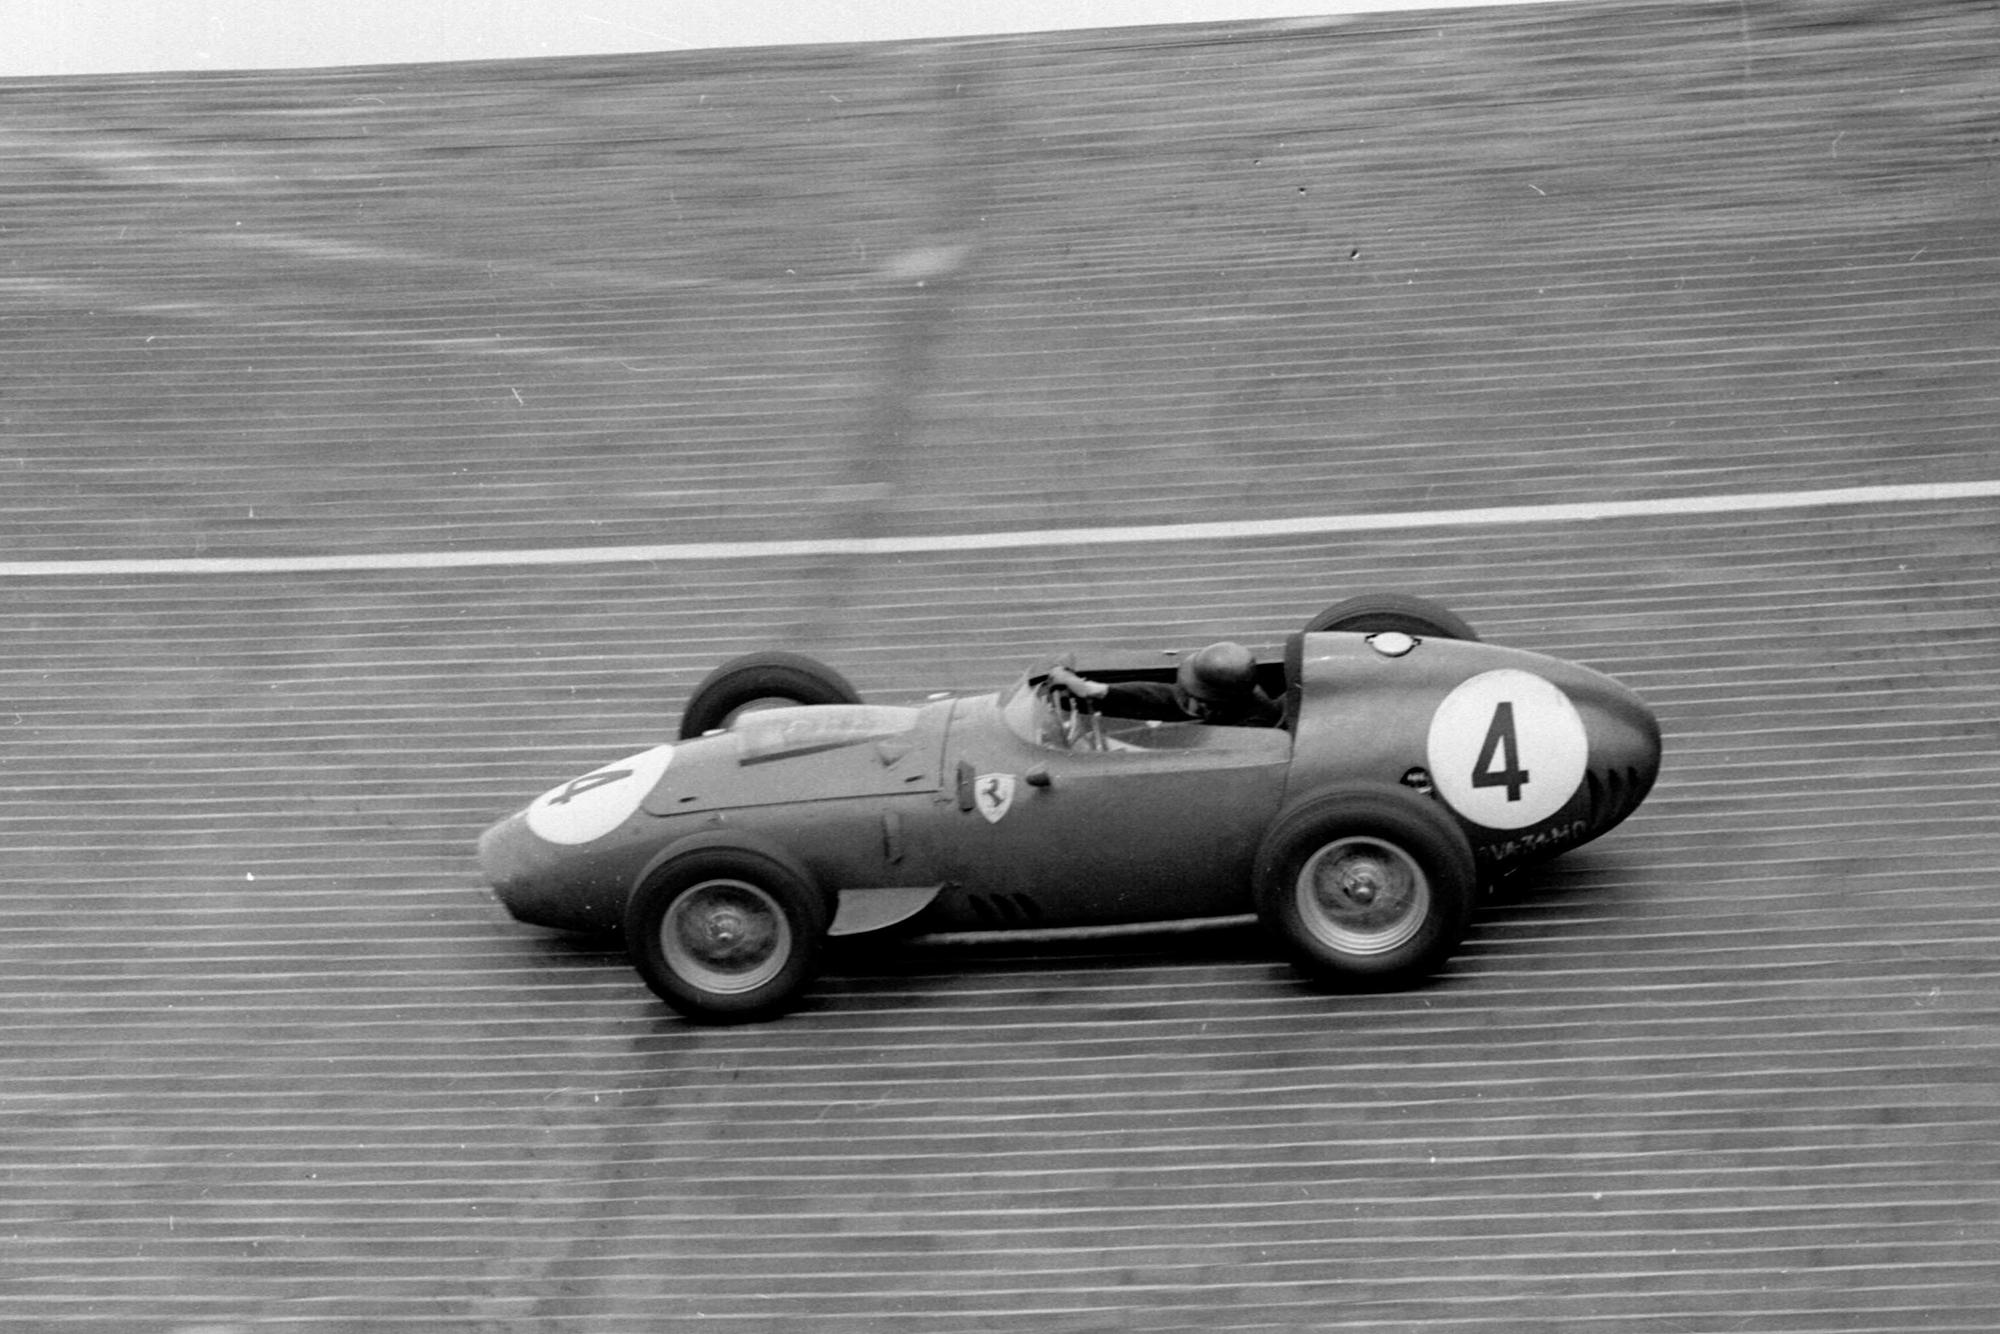 Tony Brooks' Ferrari Dino 246 on the banked North Turn.